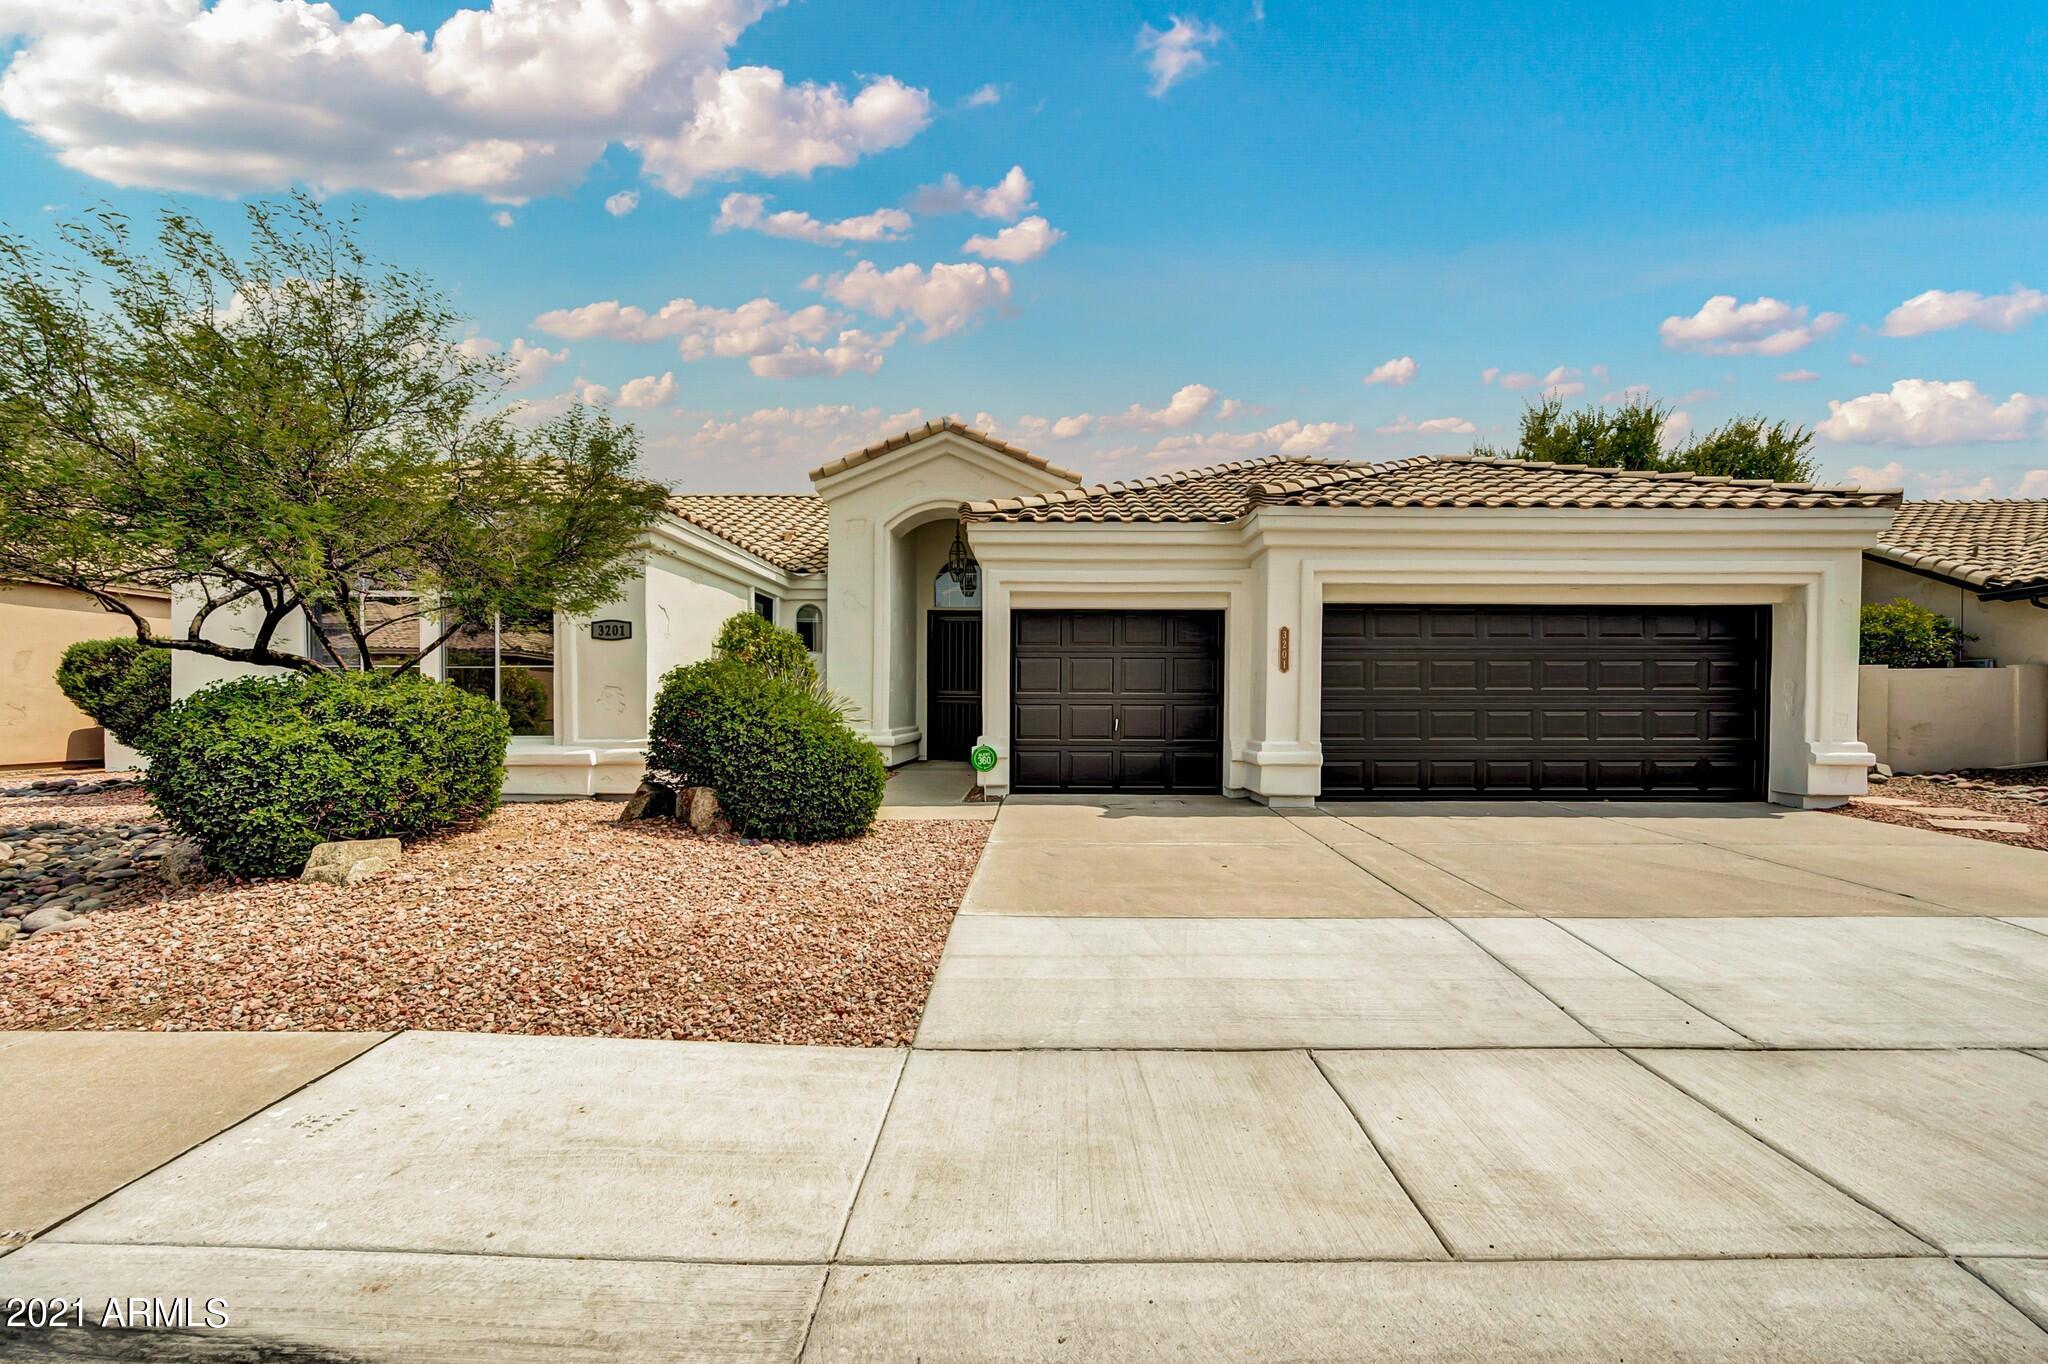 3201 W DRAKE Street, Chandler, AZ 85226, 4 Bedrooms Bedrooms, ,Residential,For Sale,3201 W DRAKE Street,6269187